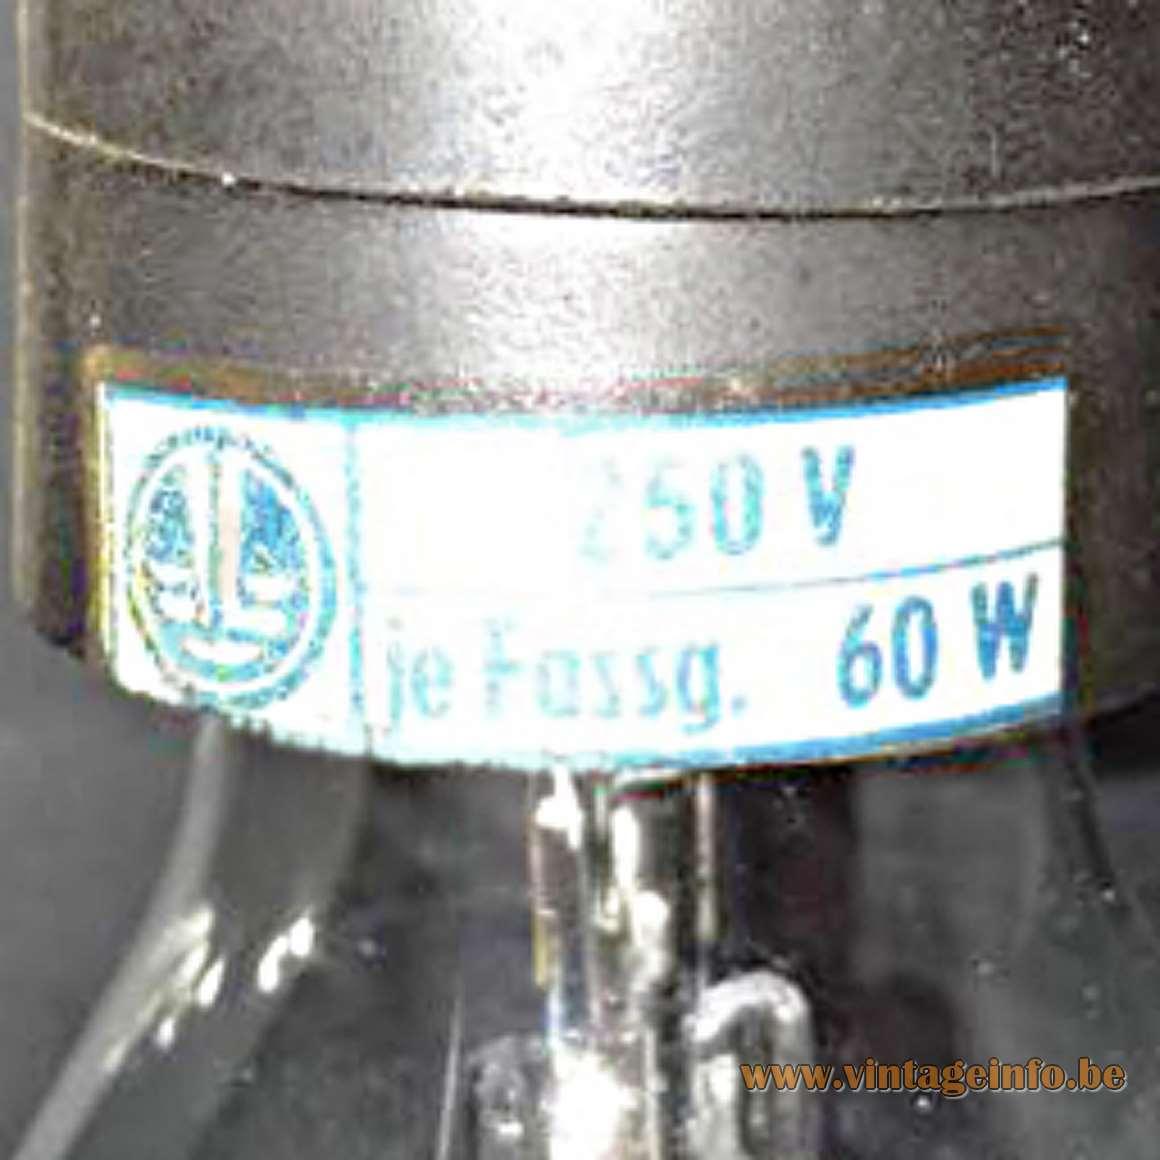 1960s East German Desk Lamps VEB Leuchtenbau Lengefeld Wittig und Schwabe socket label